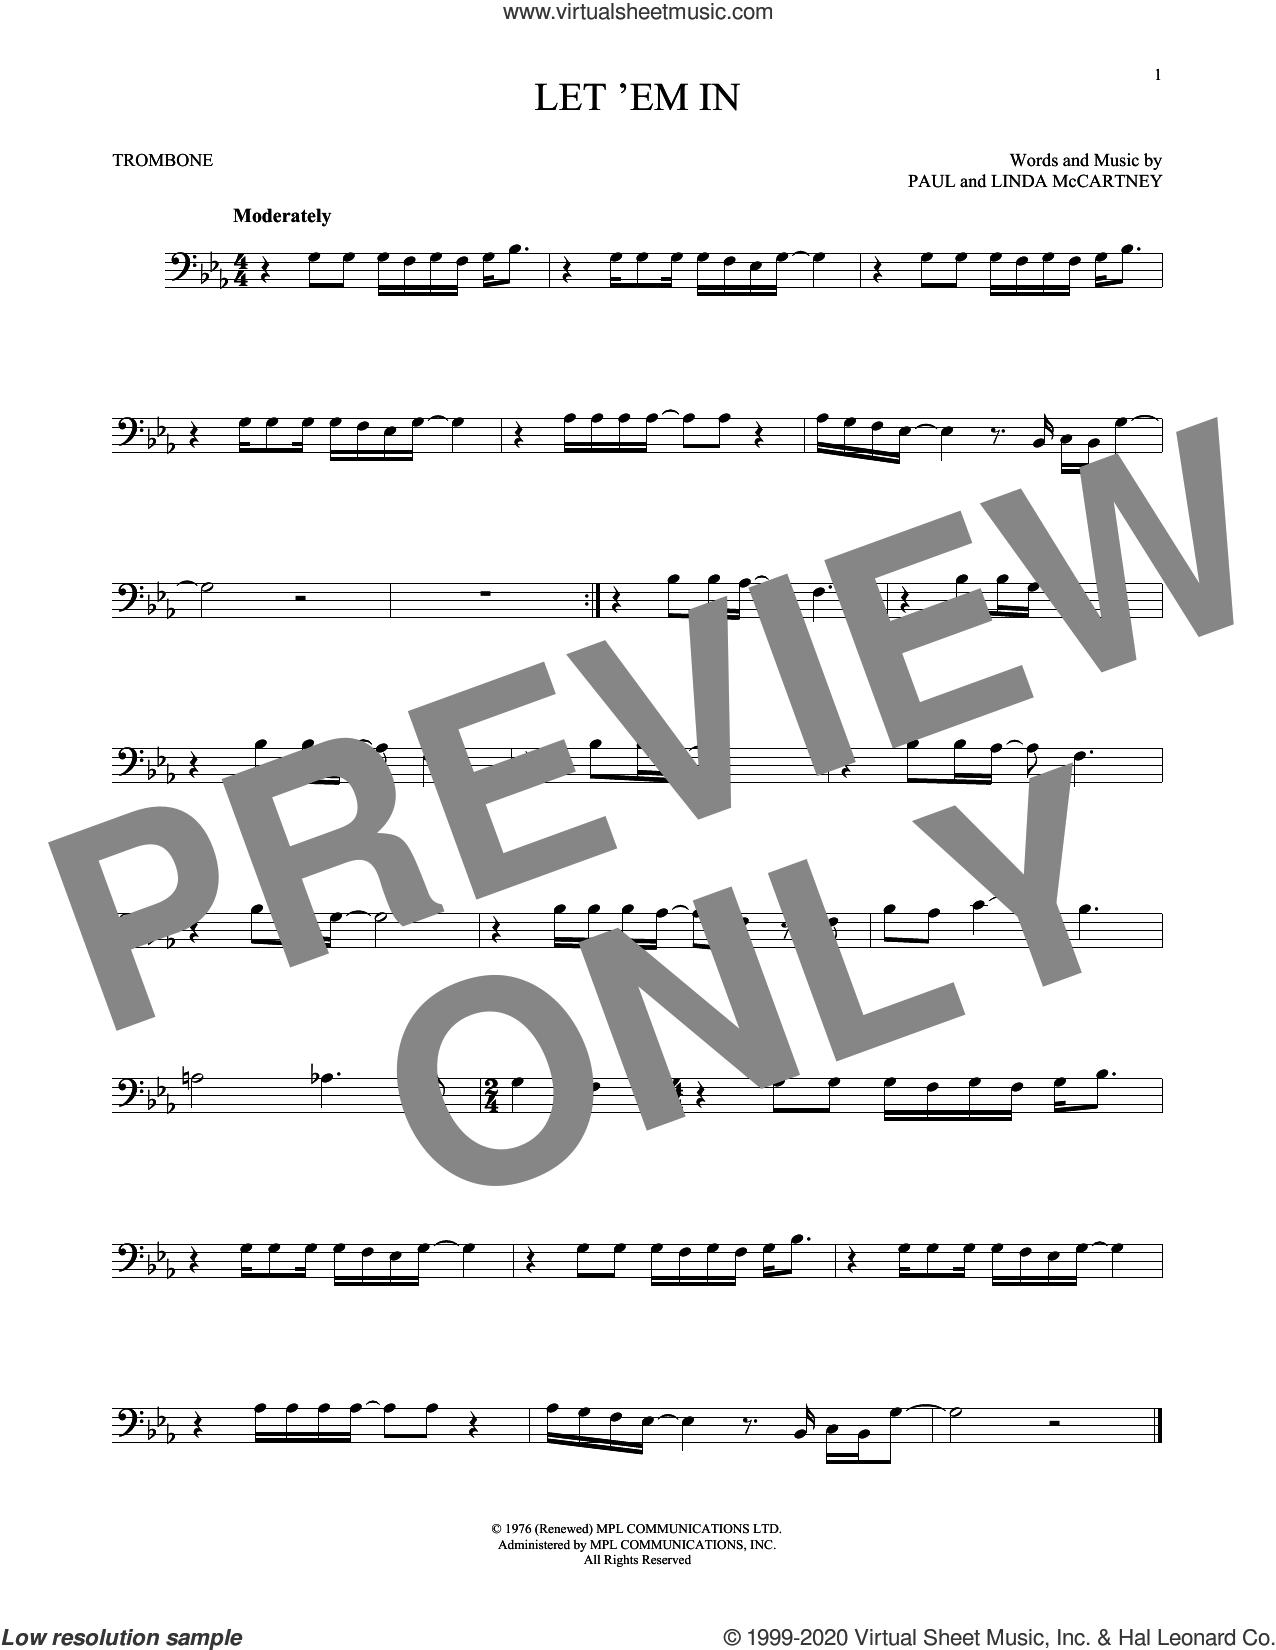 Let 'Em In sheet music for trombone solo by Wings, Linda McCartney and Paul McCartney, intermediate skill level